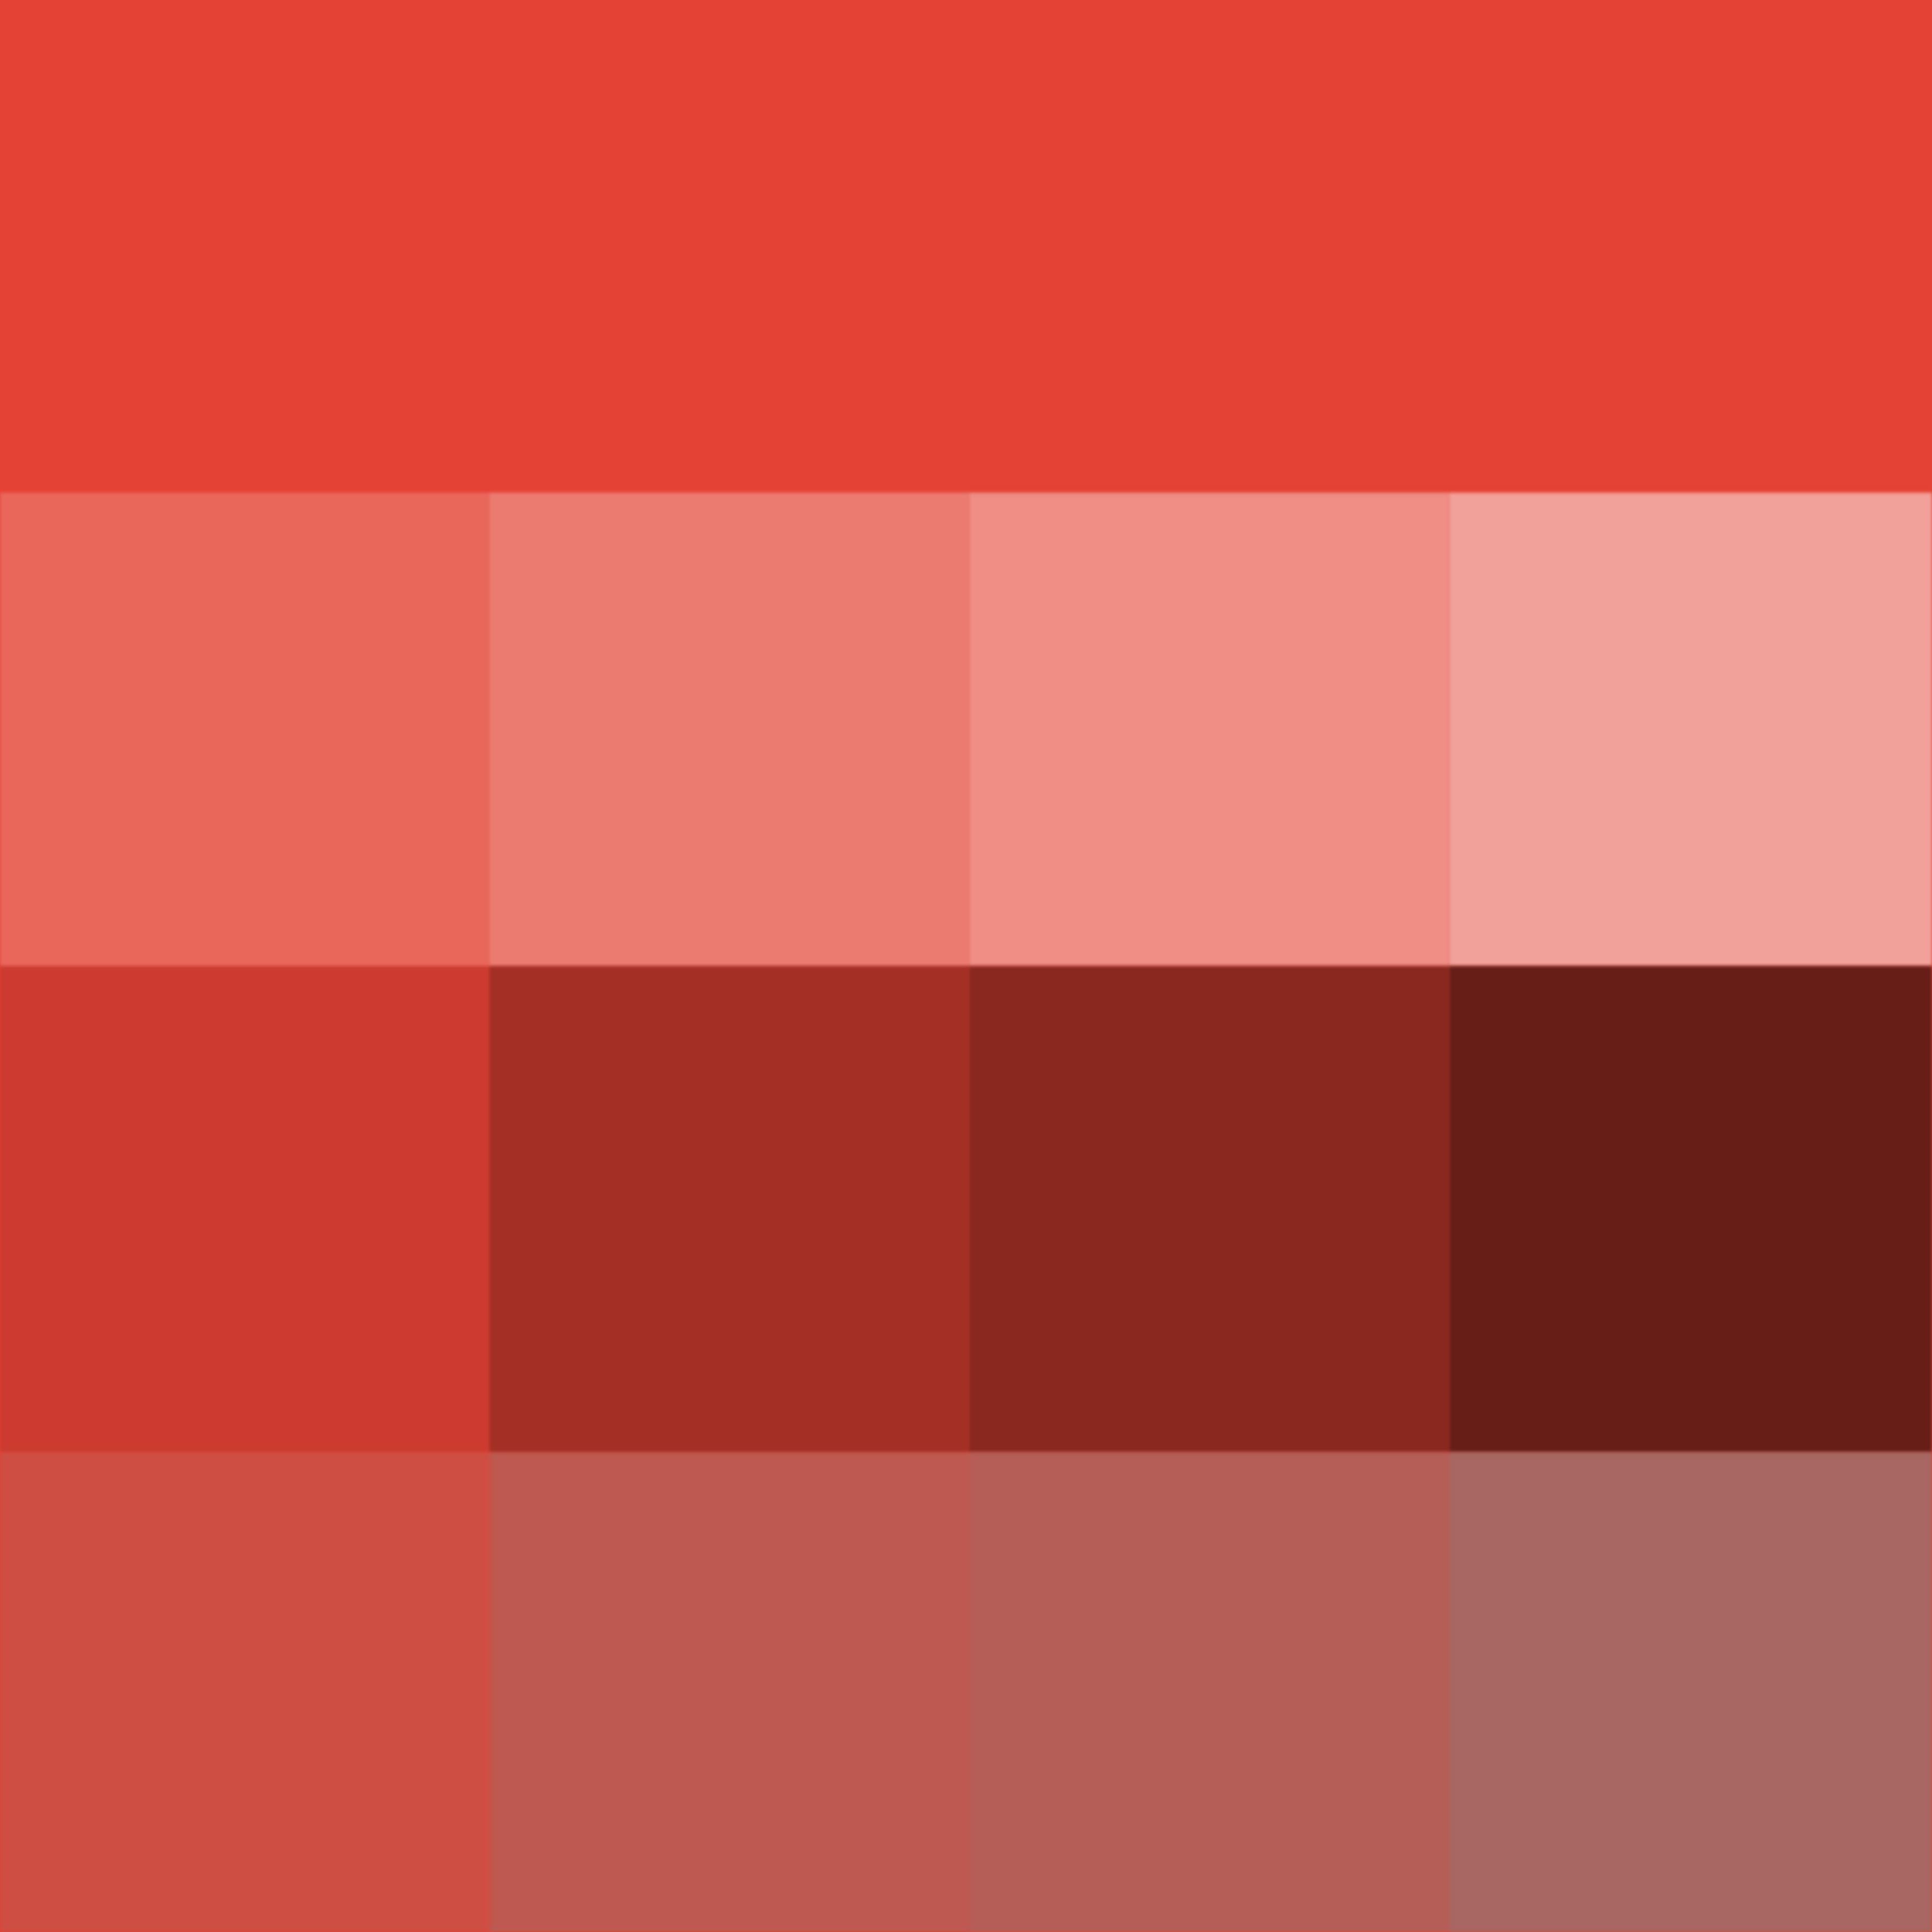 Vermillion Hue Tints Shades Amp Tones Hue Pure Color